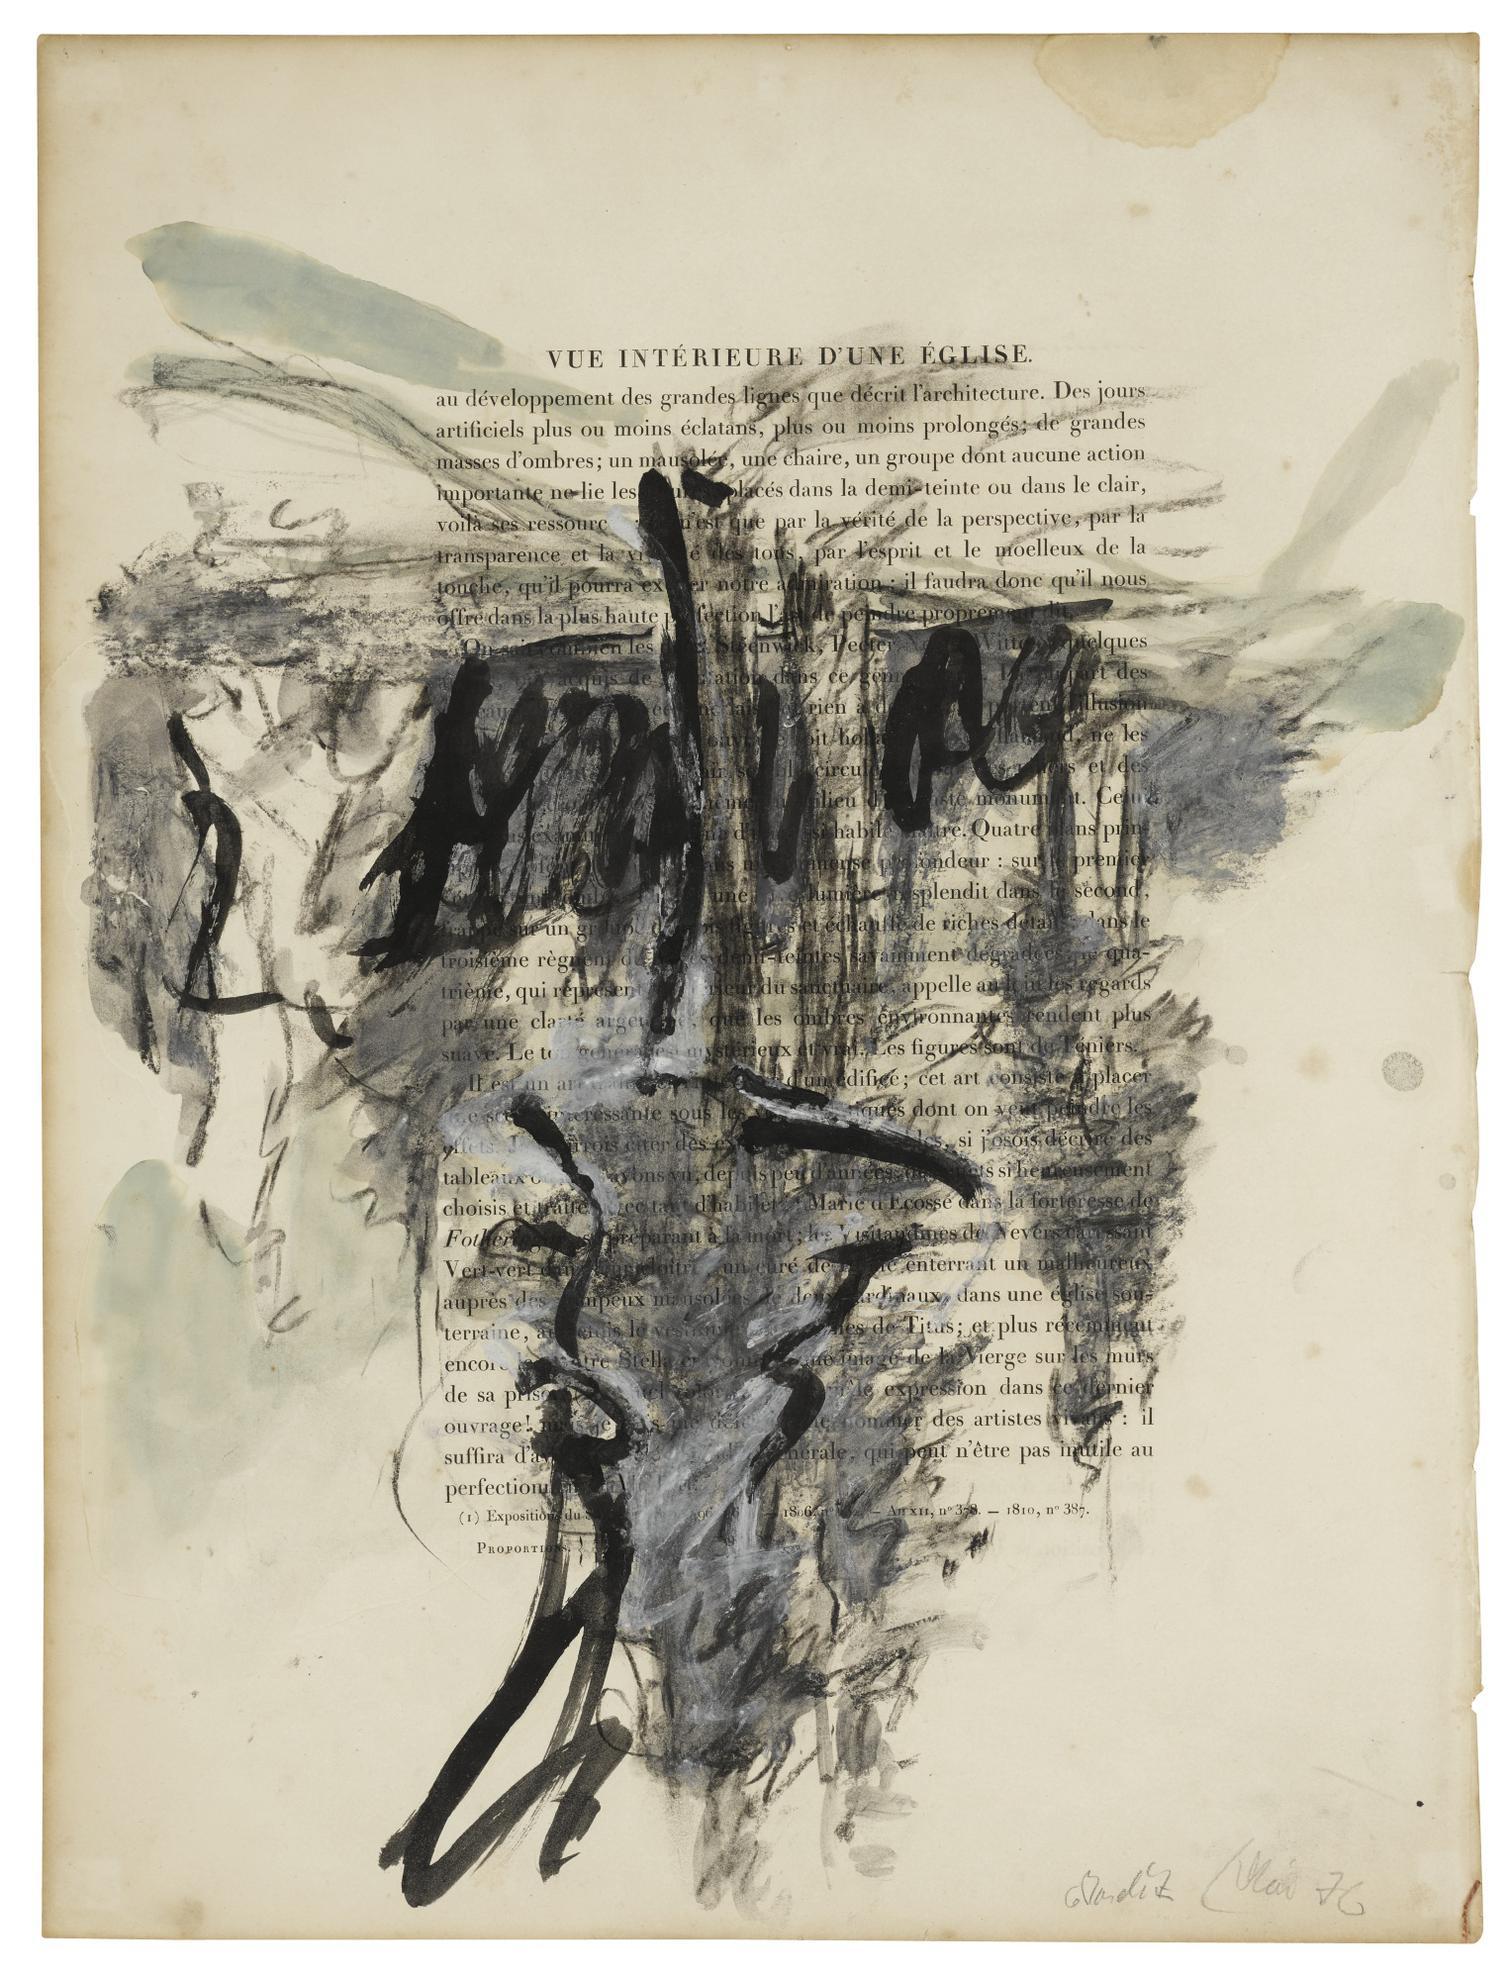 Georg Baselitz-Vue Interieure Dune Eglise-1976